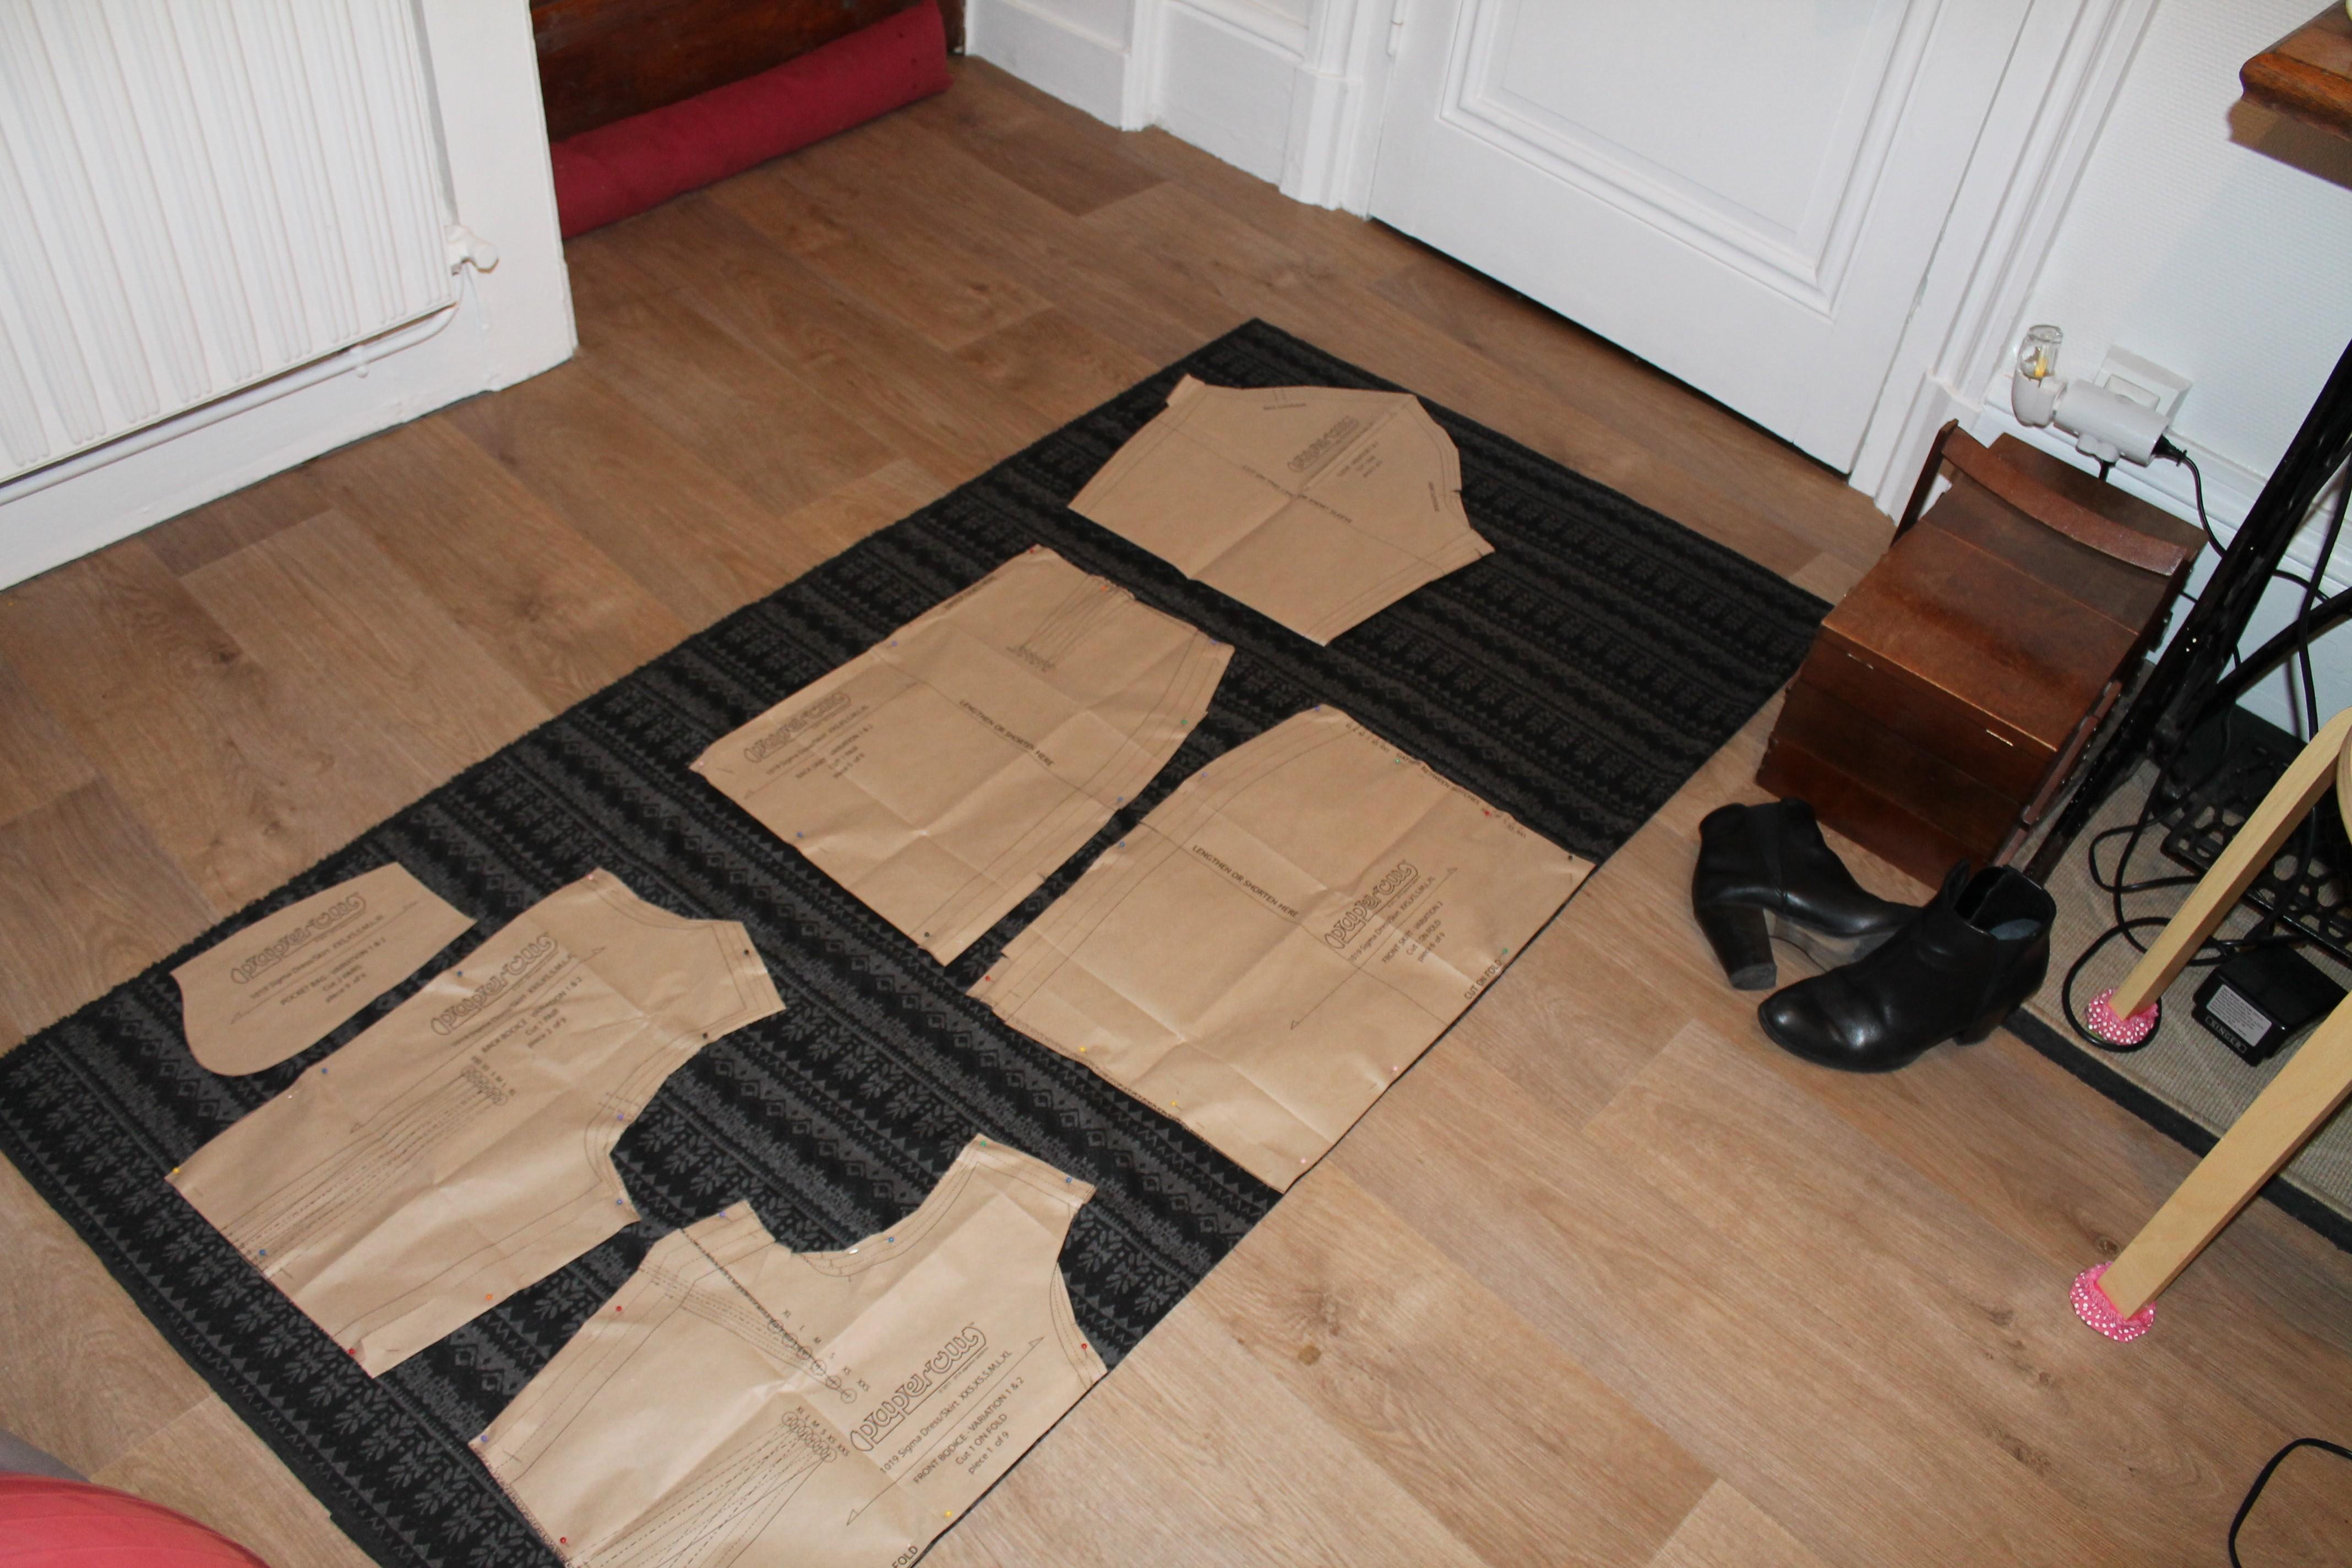 blog-couture-patron-robe-sigma-dress-pappercut-patterns-2